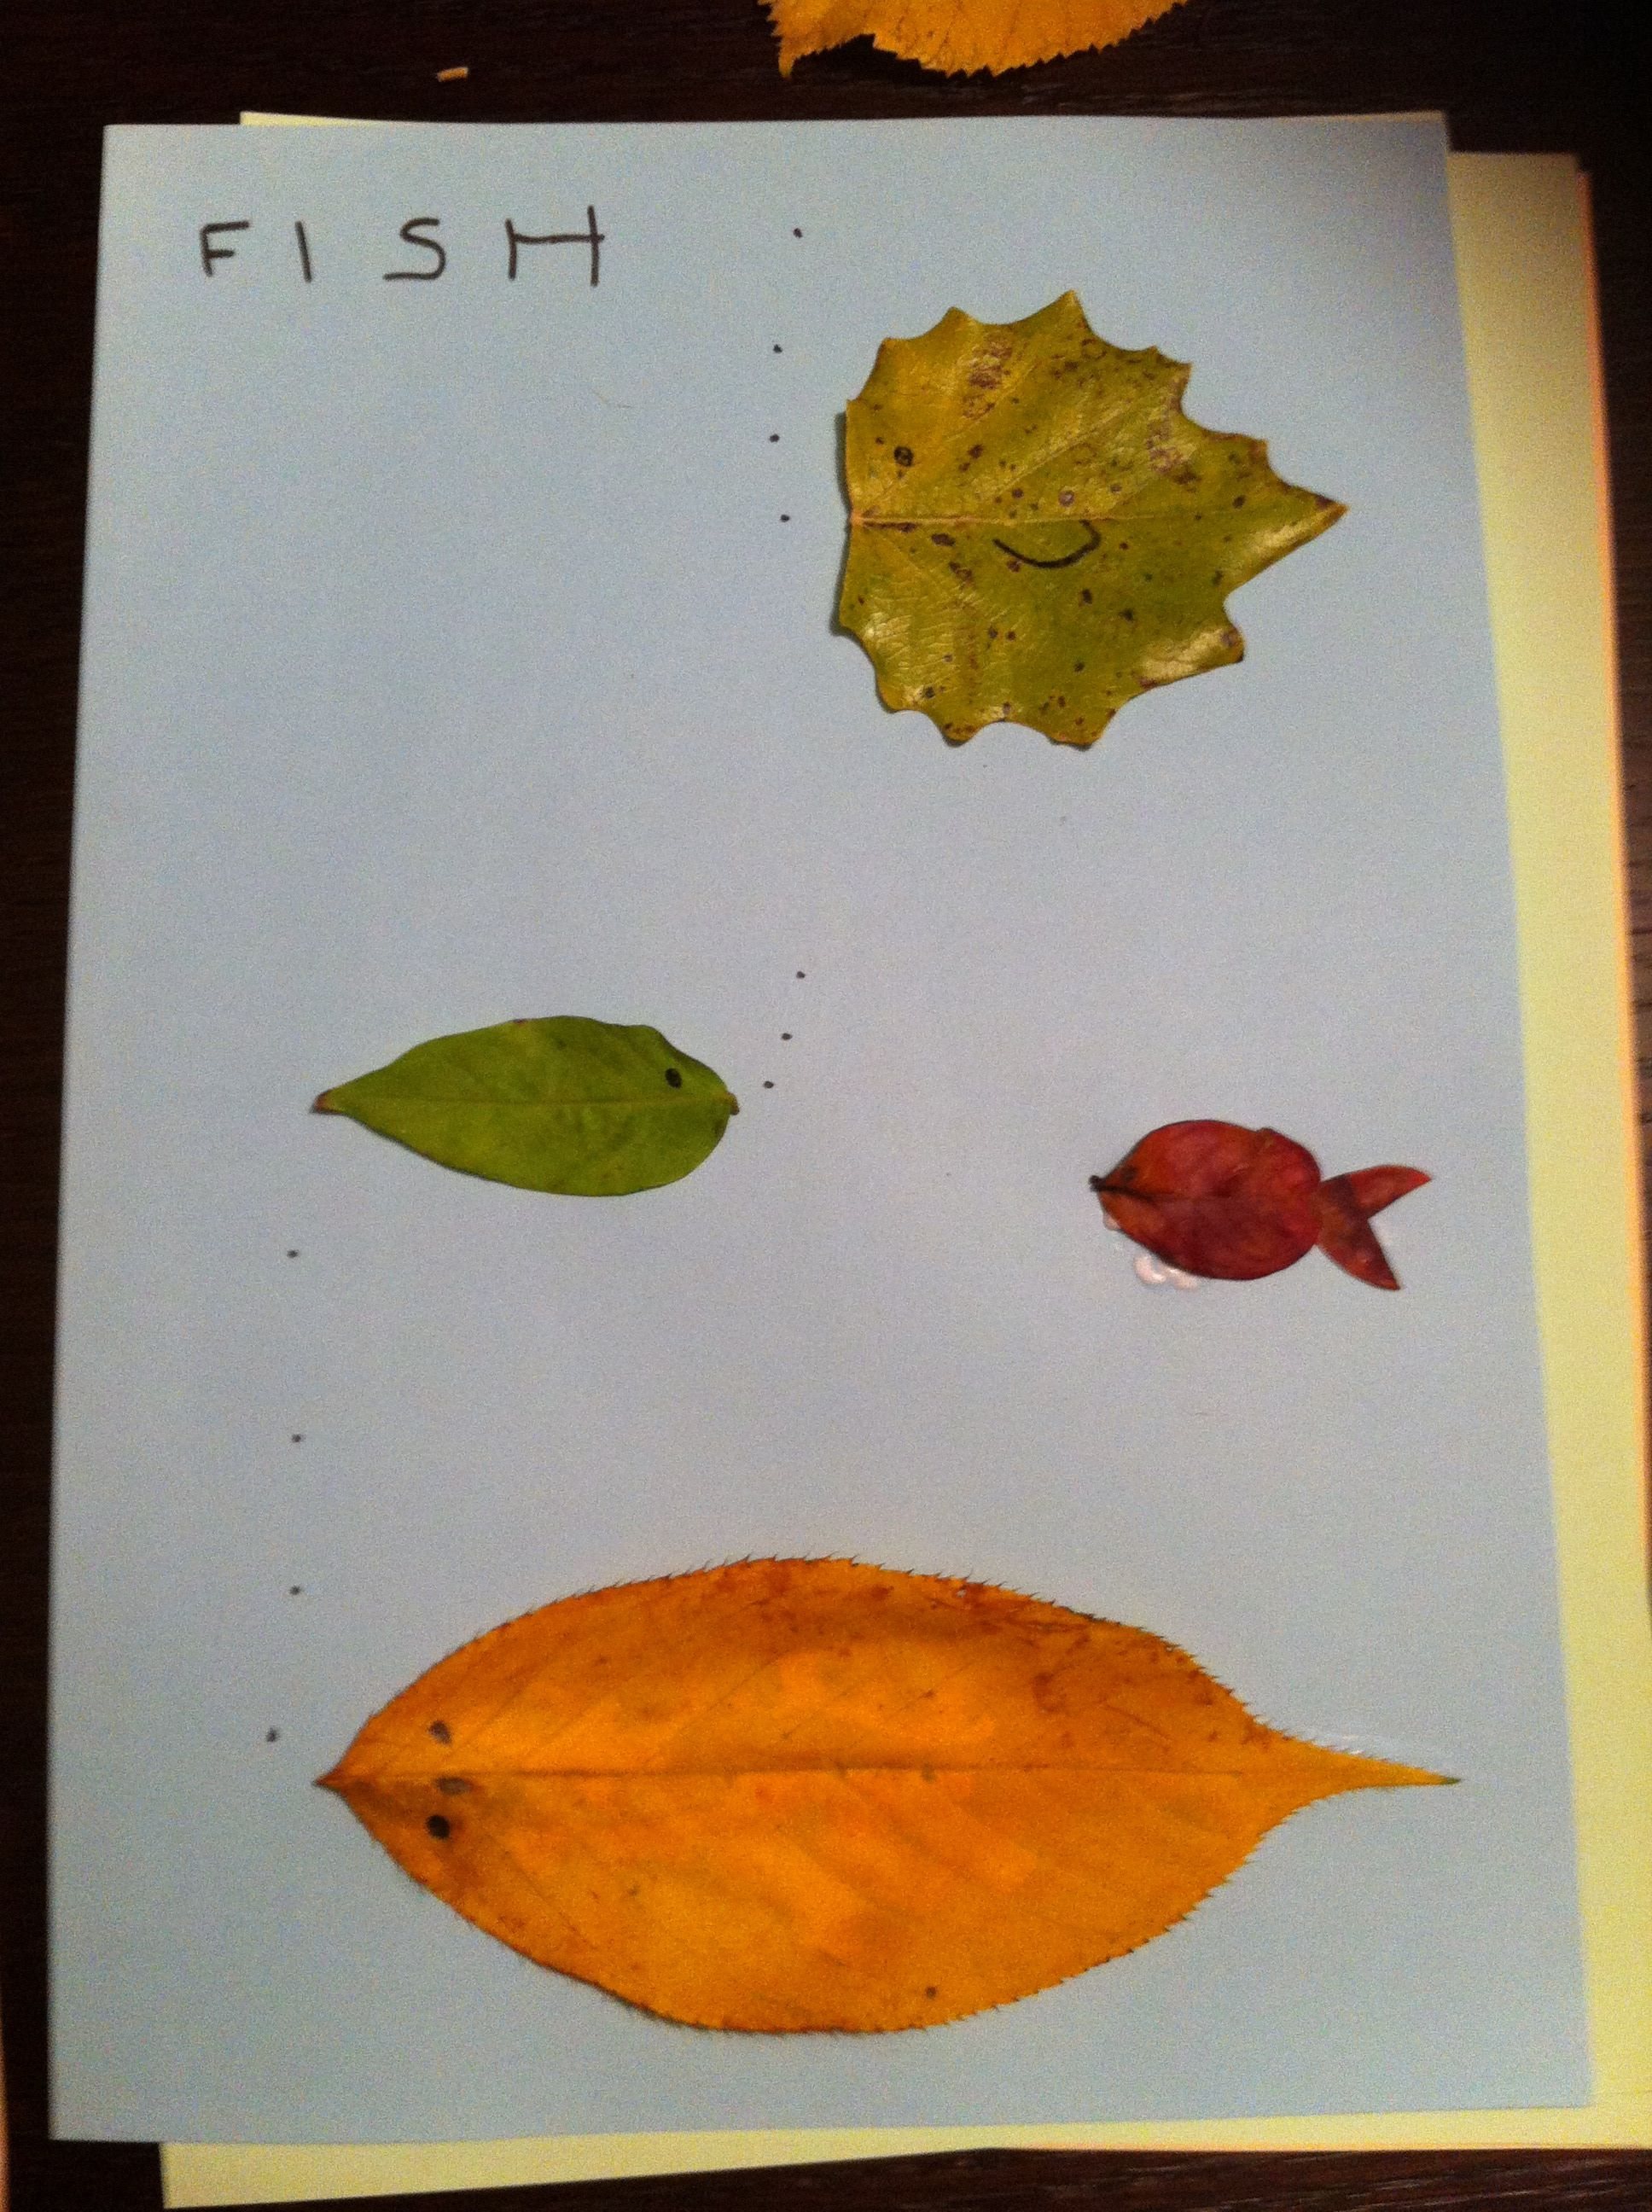 Fishing leaves